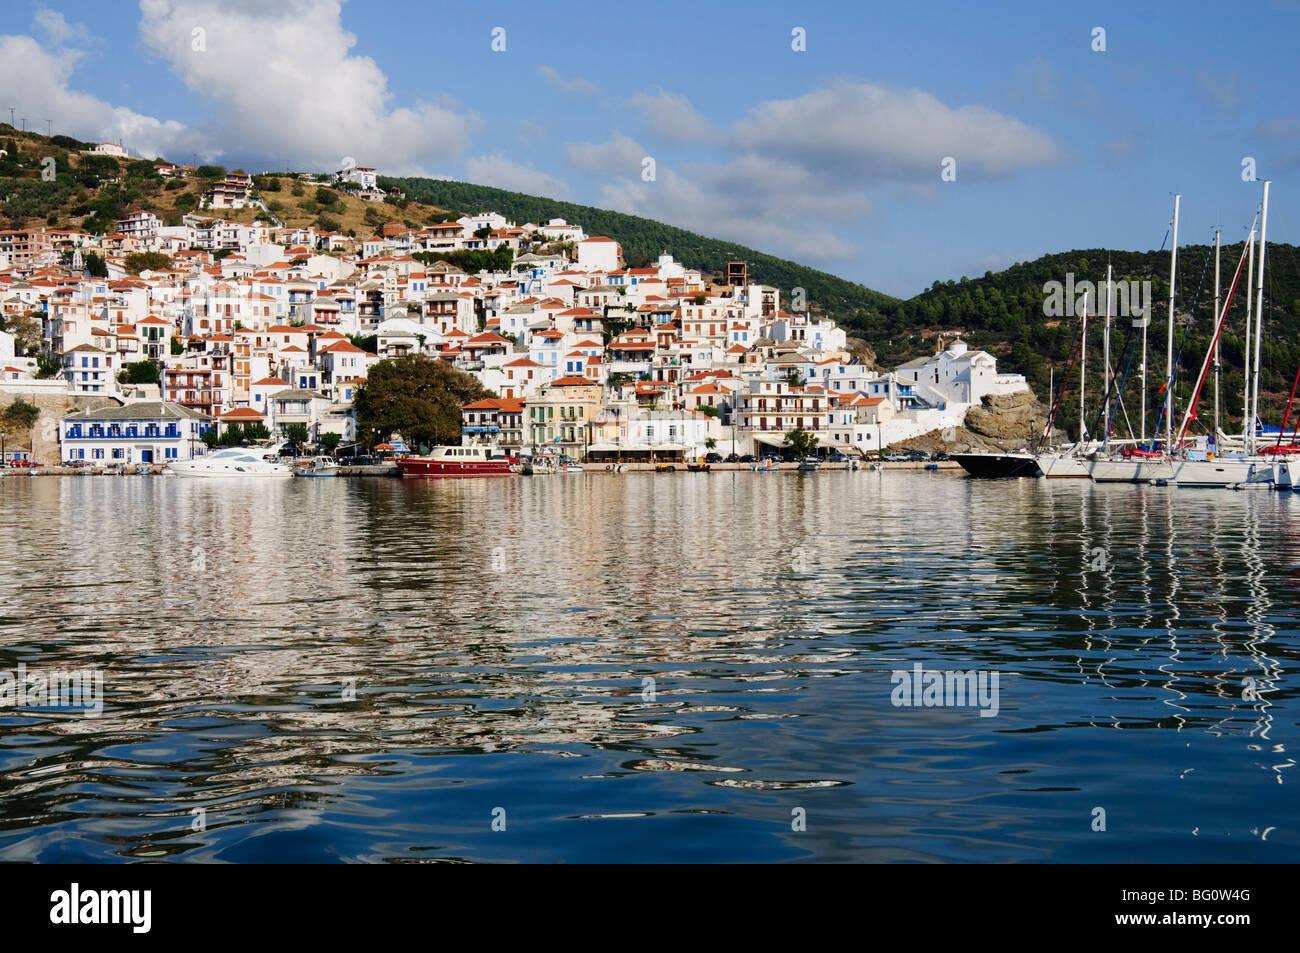 Skopelos Town, Skopelos, Sporades Islands, Greek Islands, Greece, Europe Stock Photo